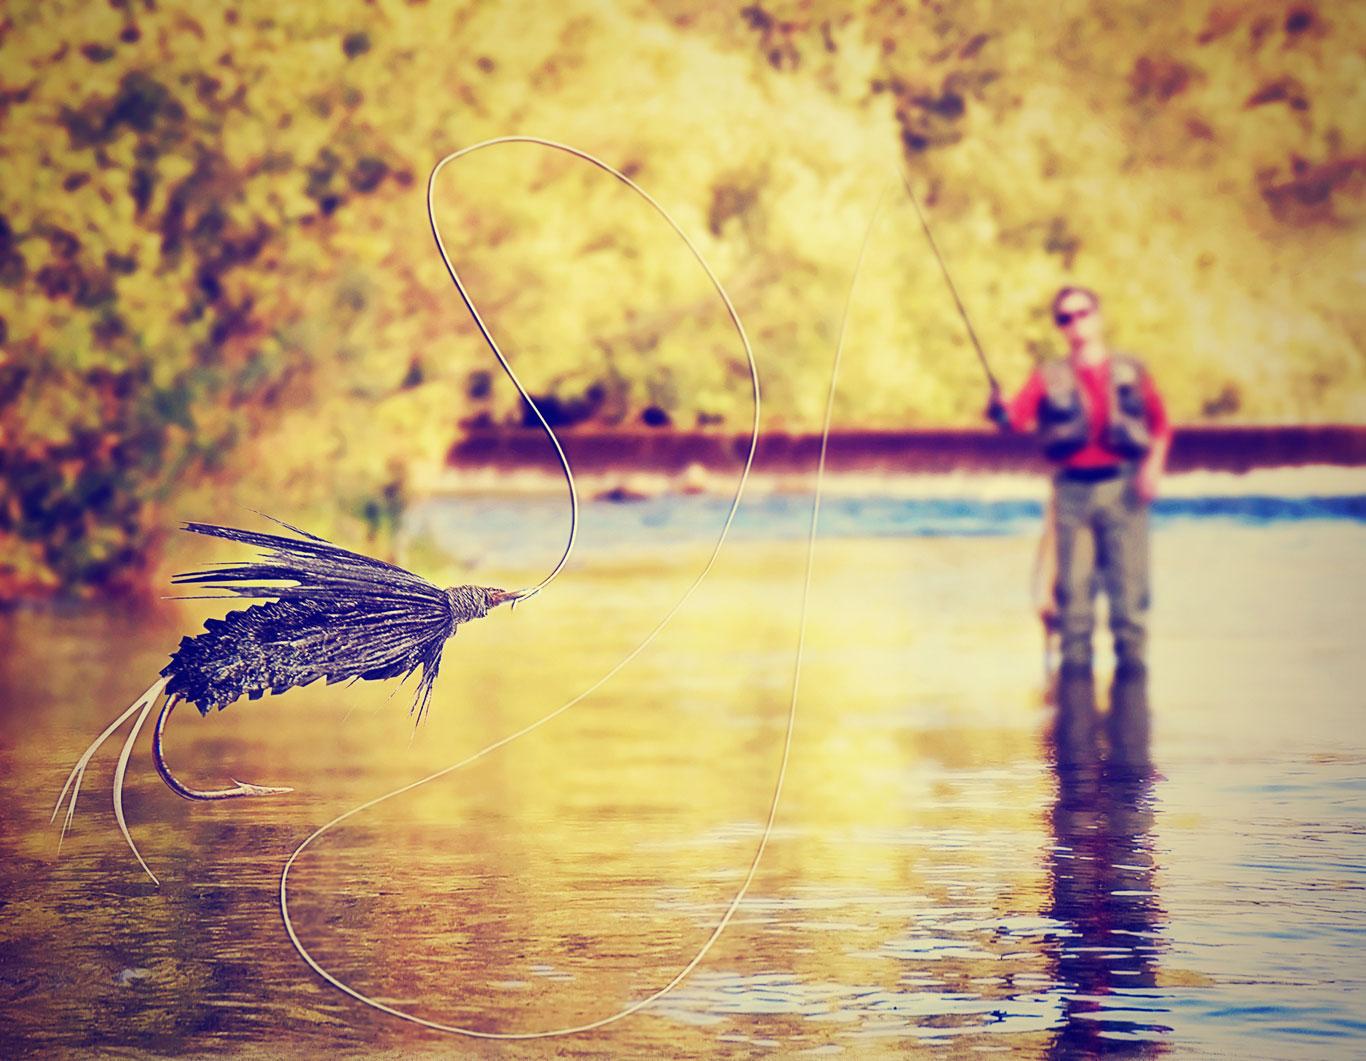 Camping-fly-fishing-1366-0618